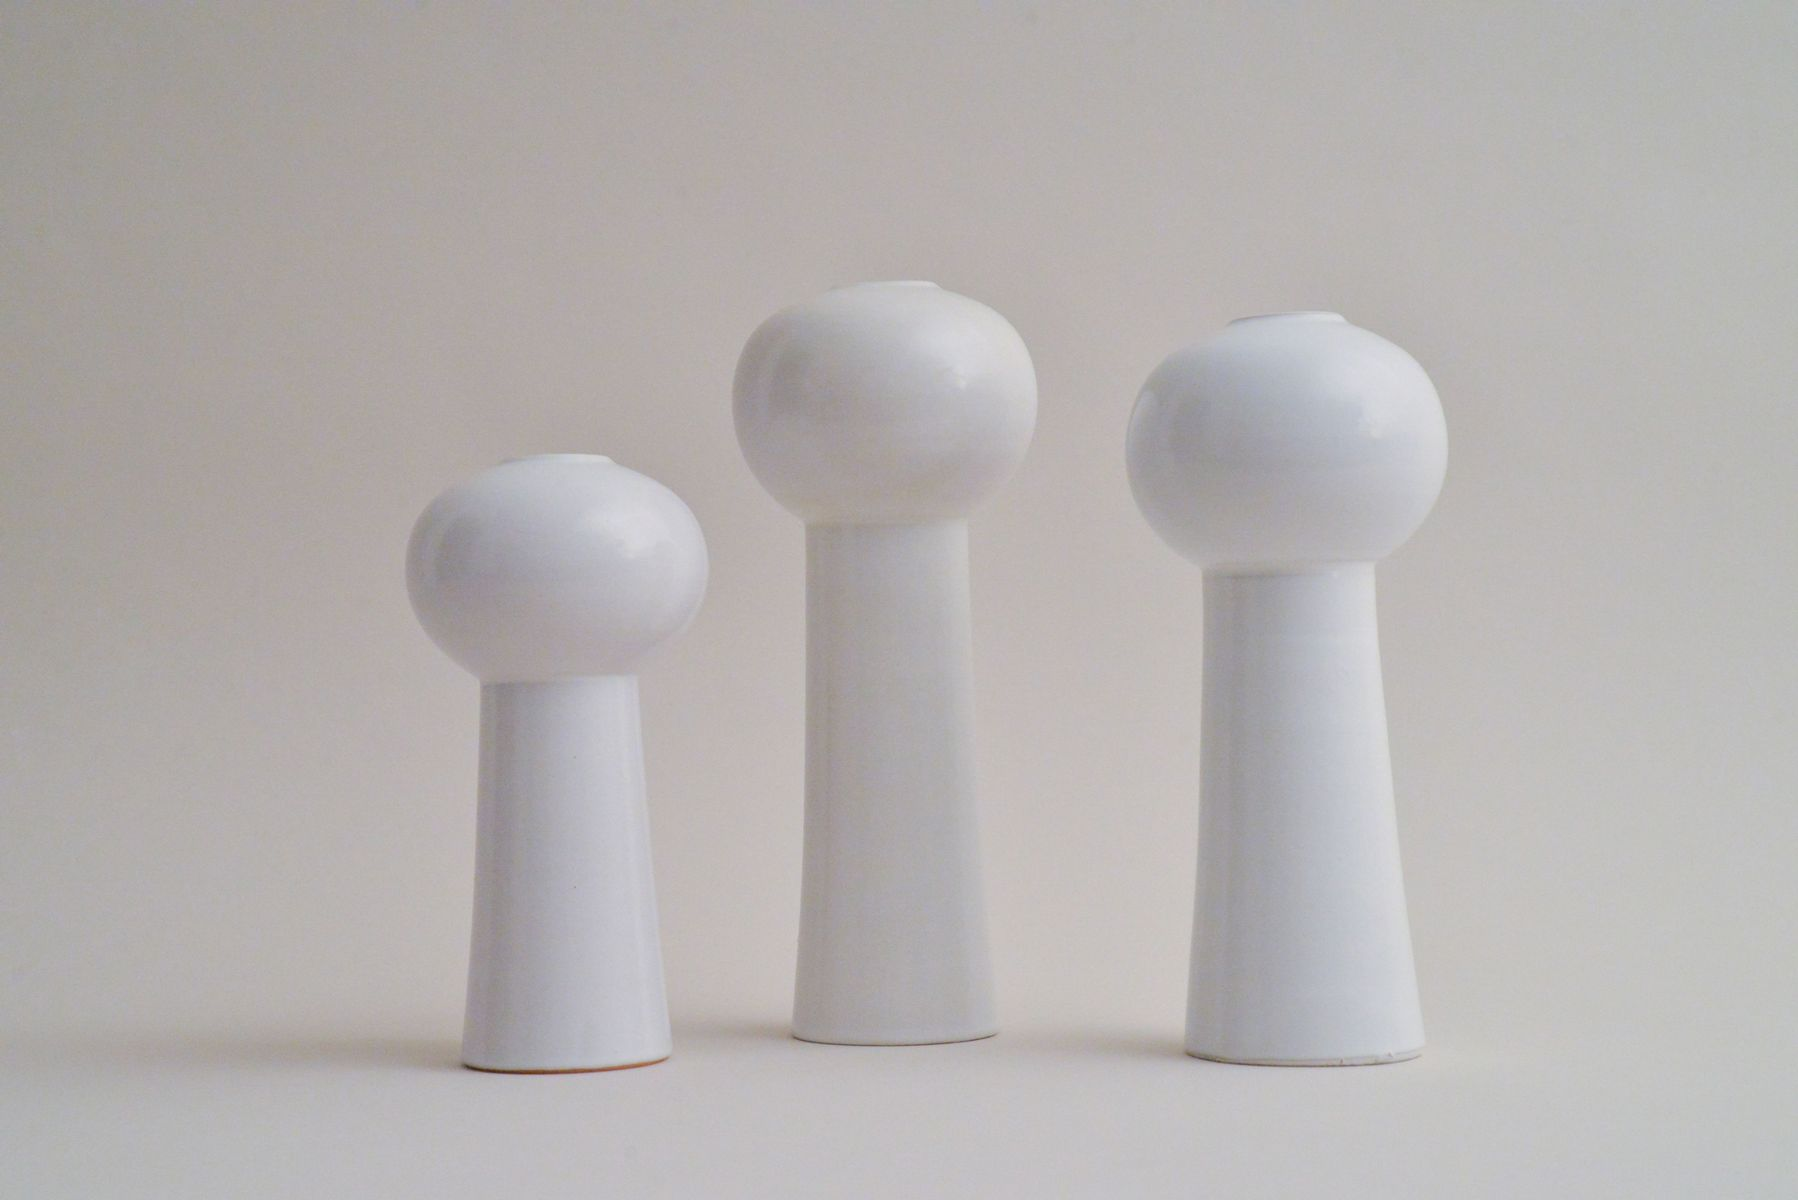 interesting white ceramic vases. Price per set Space Age White Ceramic Vases  Set of 3 for sale at Pamono